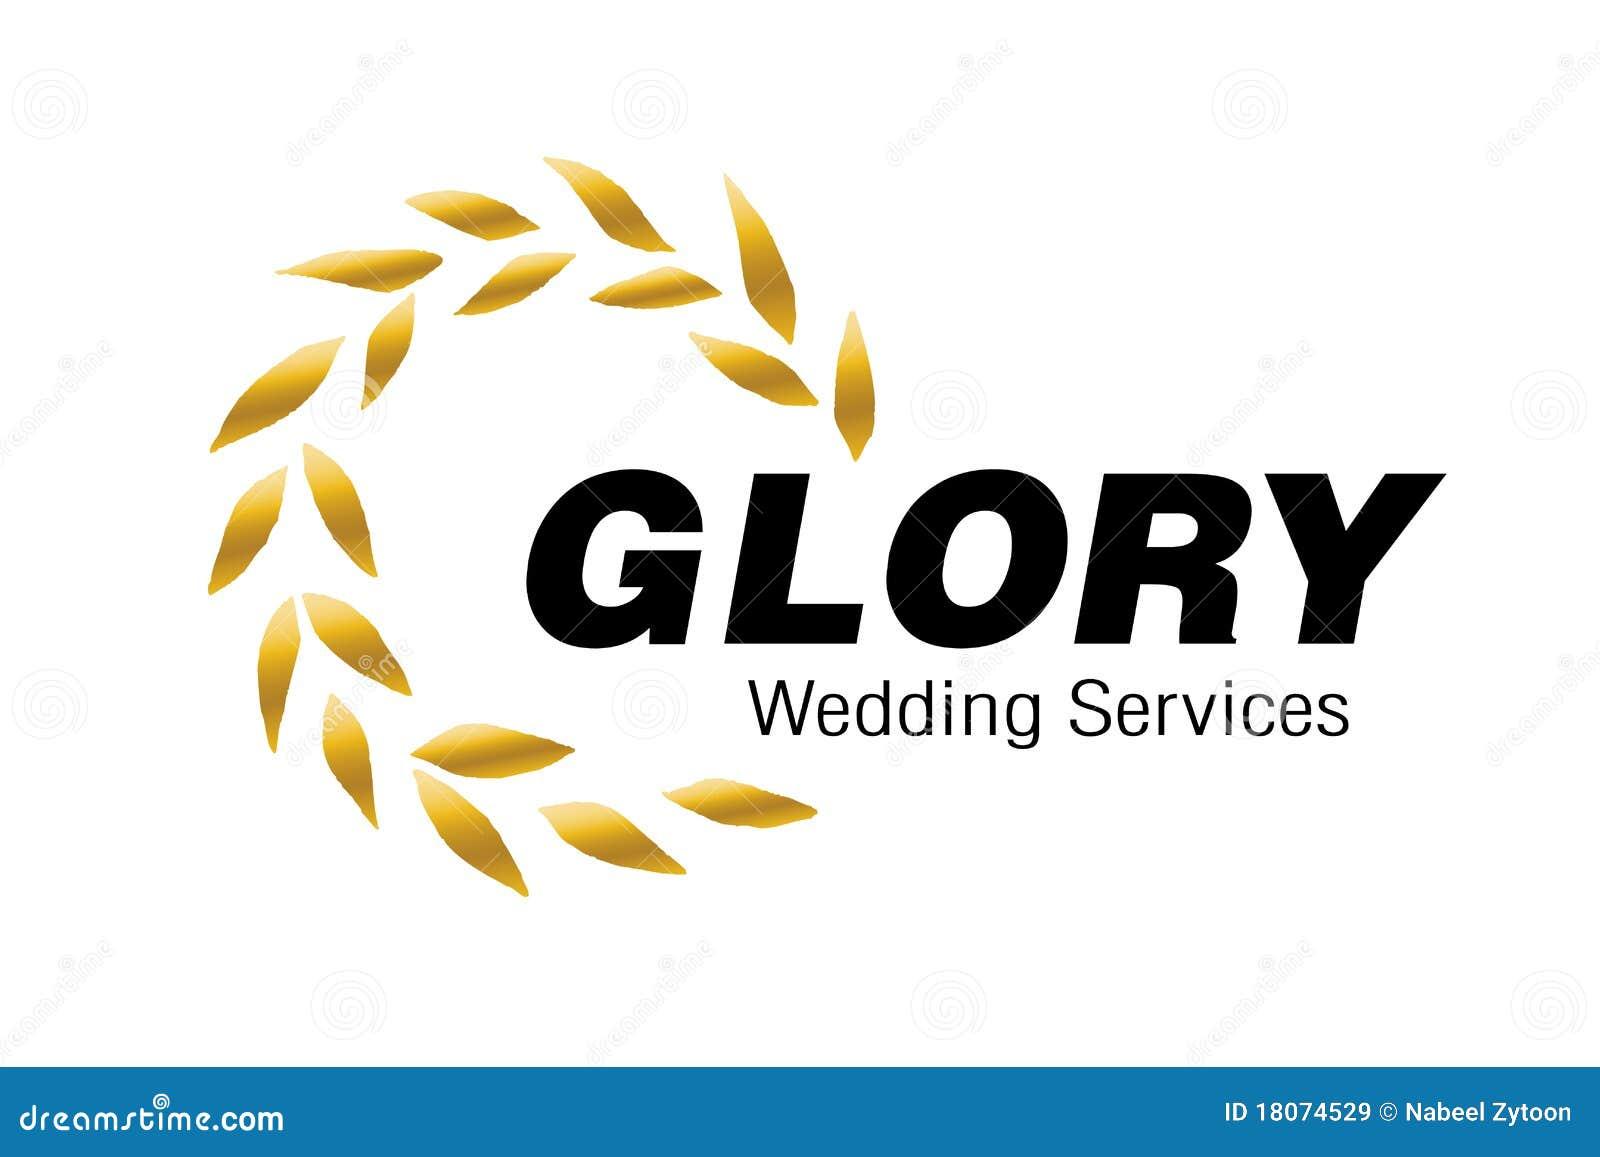 Business Logo Design Royalty Free Stock Images - Image: 18074529